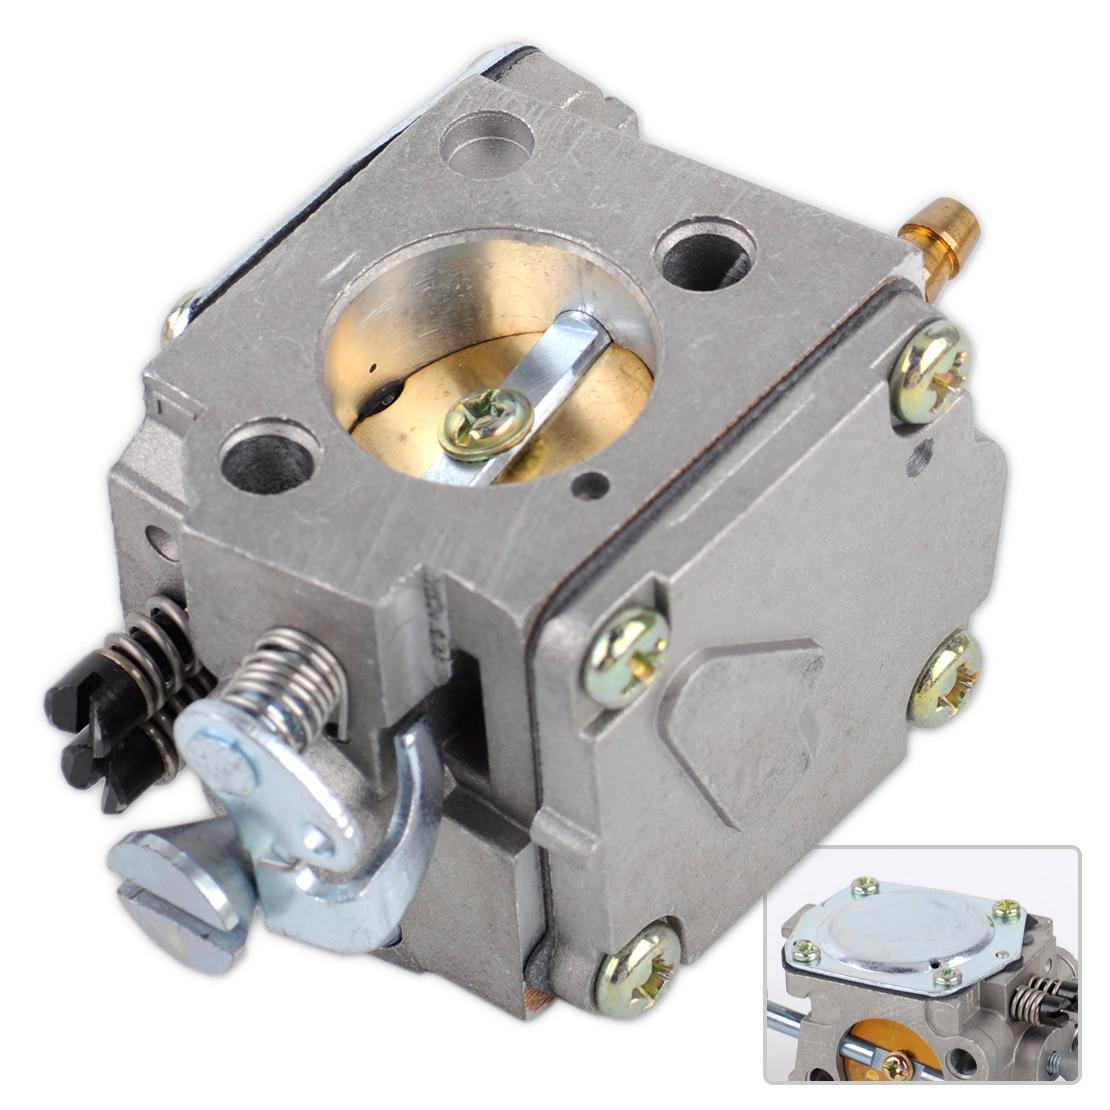 LETAOSK Carburetor Engine Motor Carb Fit For Husqvarna 61 266 268 272 272XP ChainsawAccessories